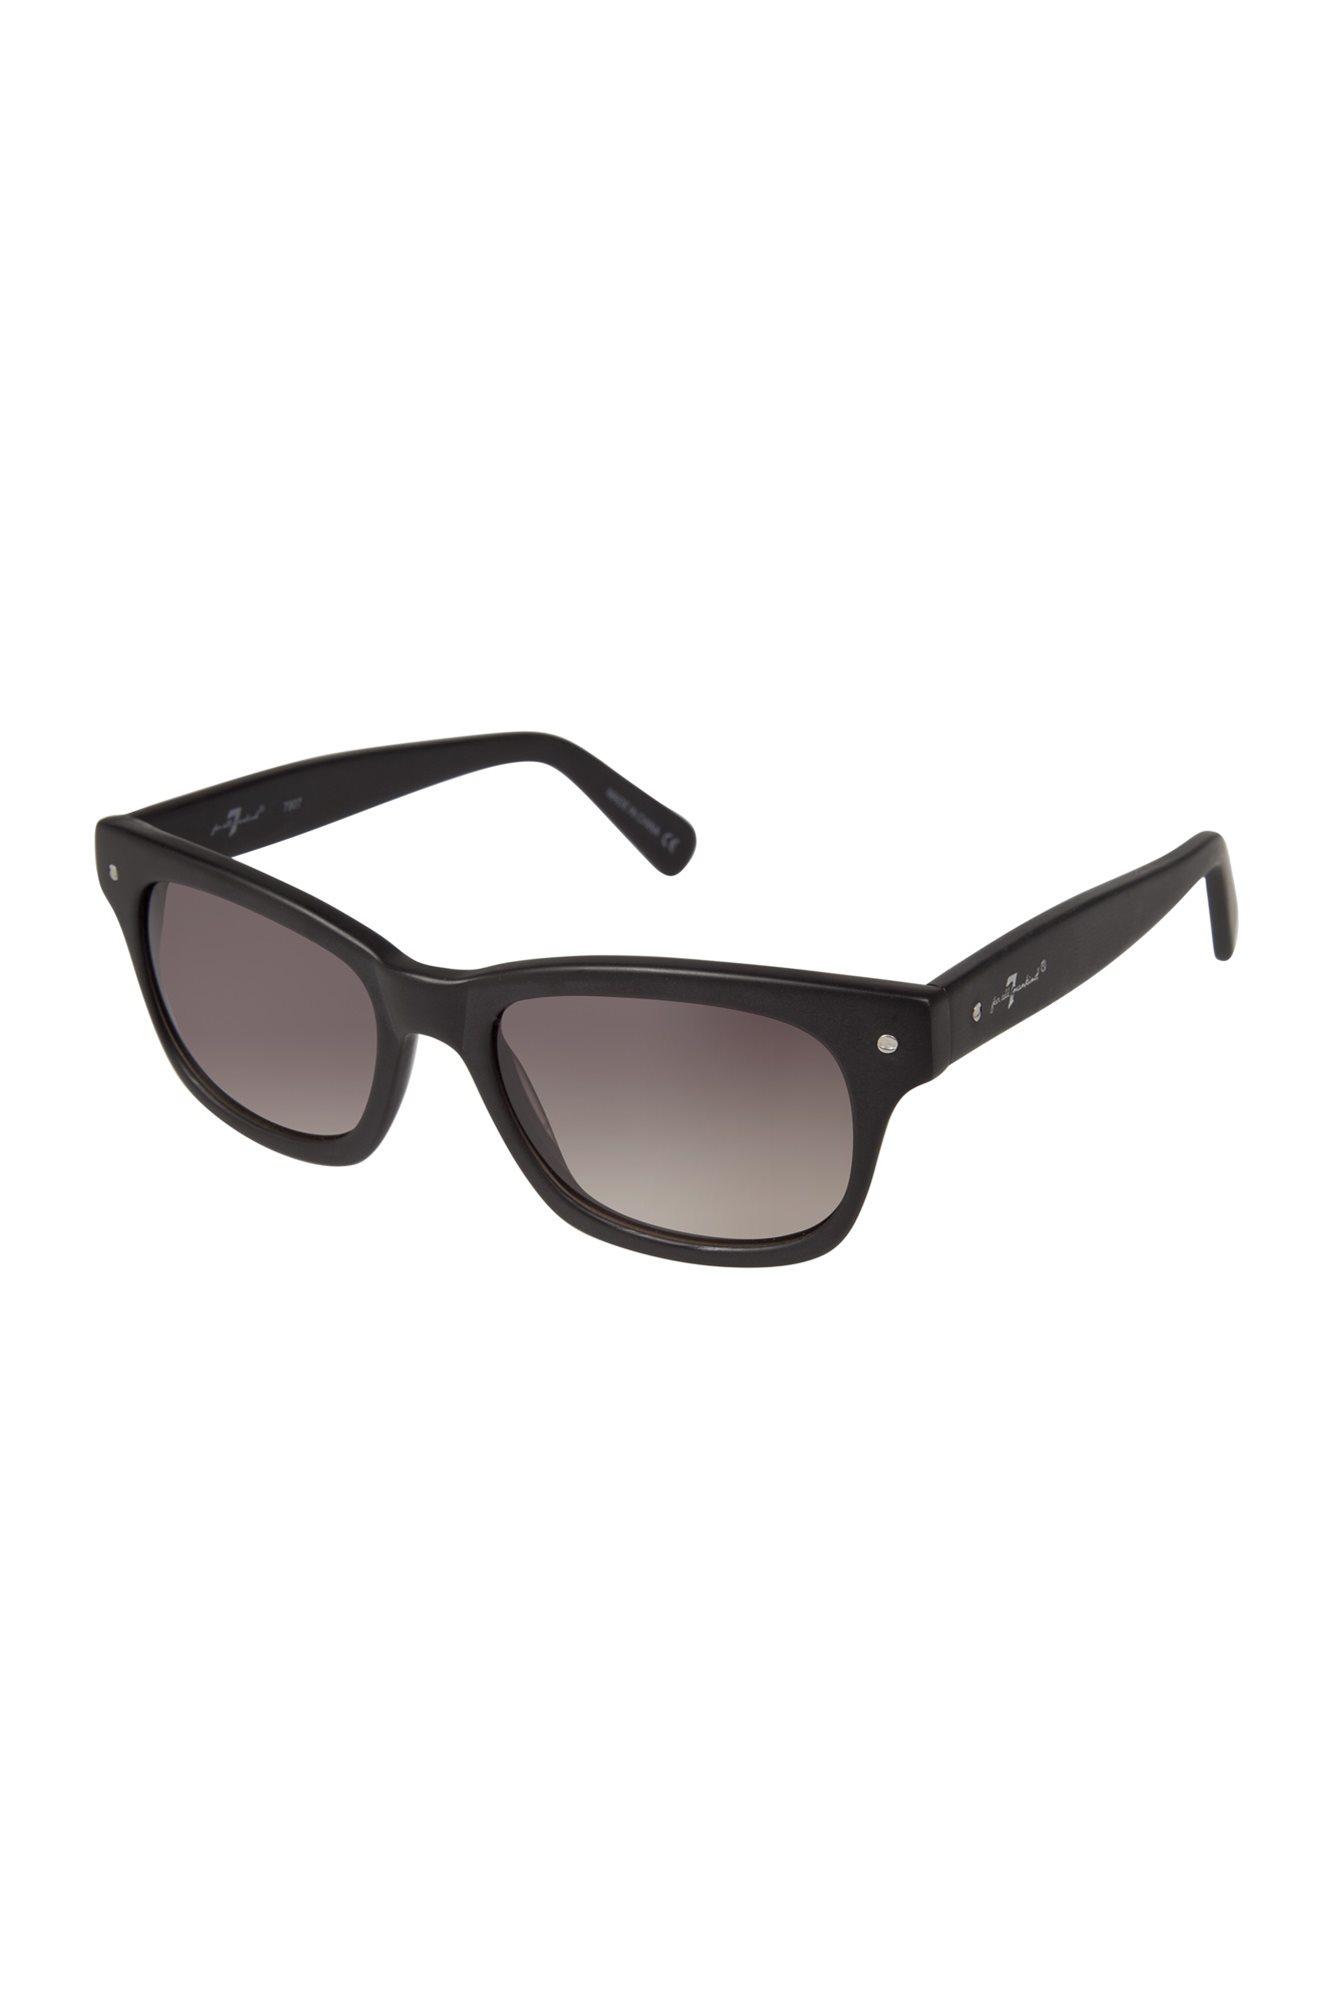 wayfarer 2 sunglasses fupm  Gallery Women's Wayfarer Sunglasses